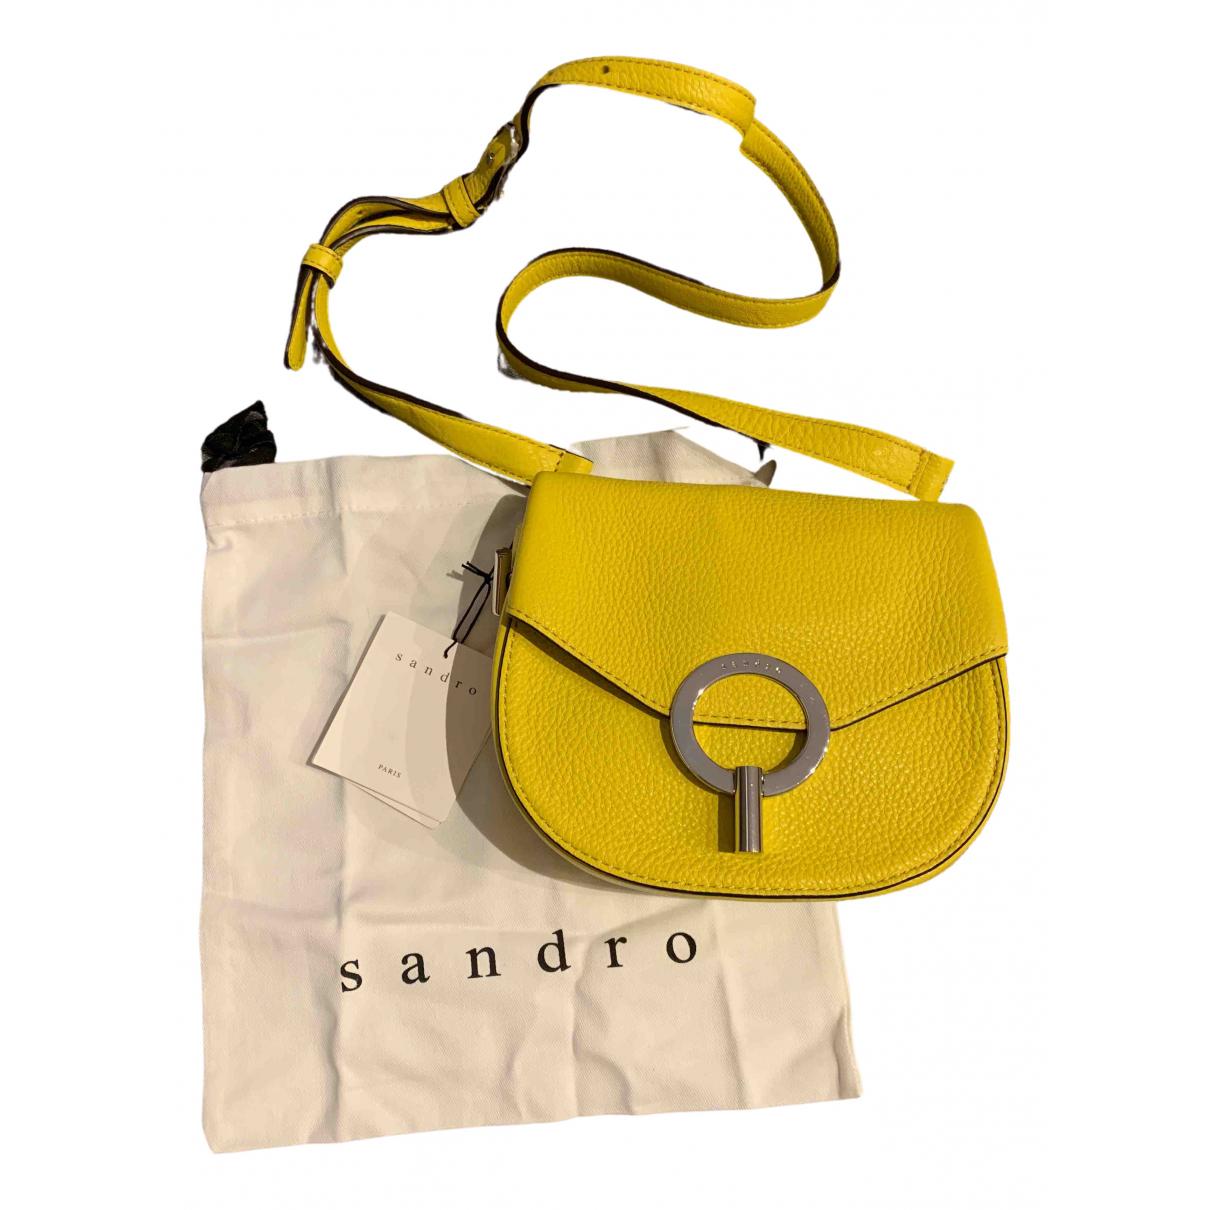 Sandro Yza Clutch in  Gelb Leder